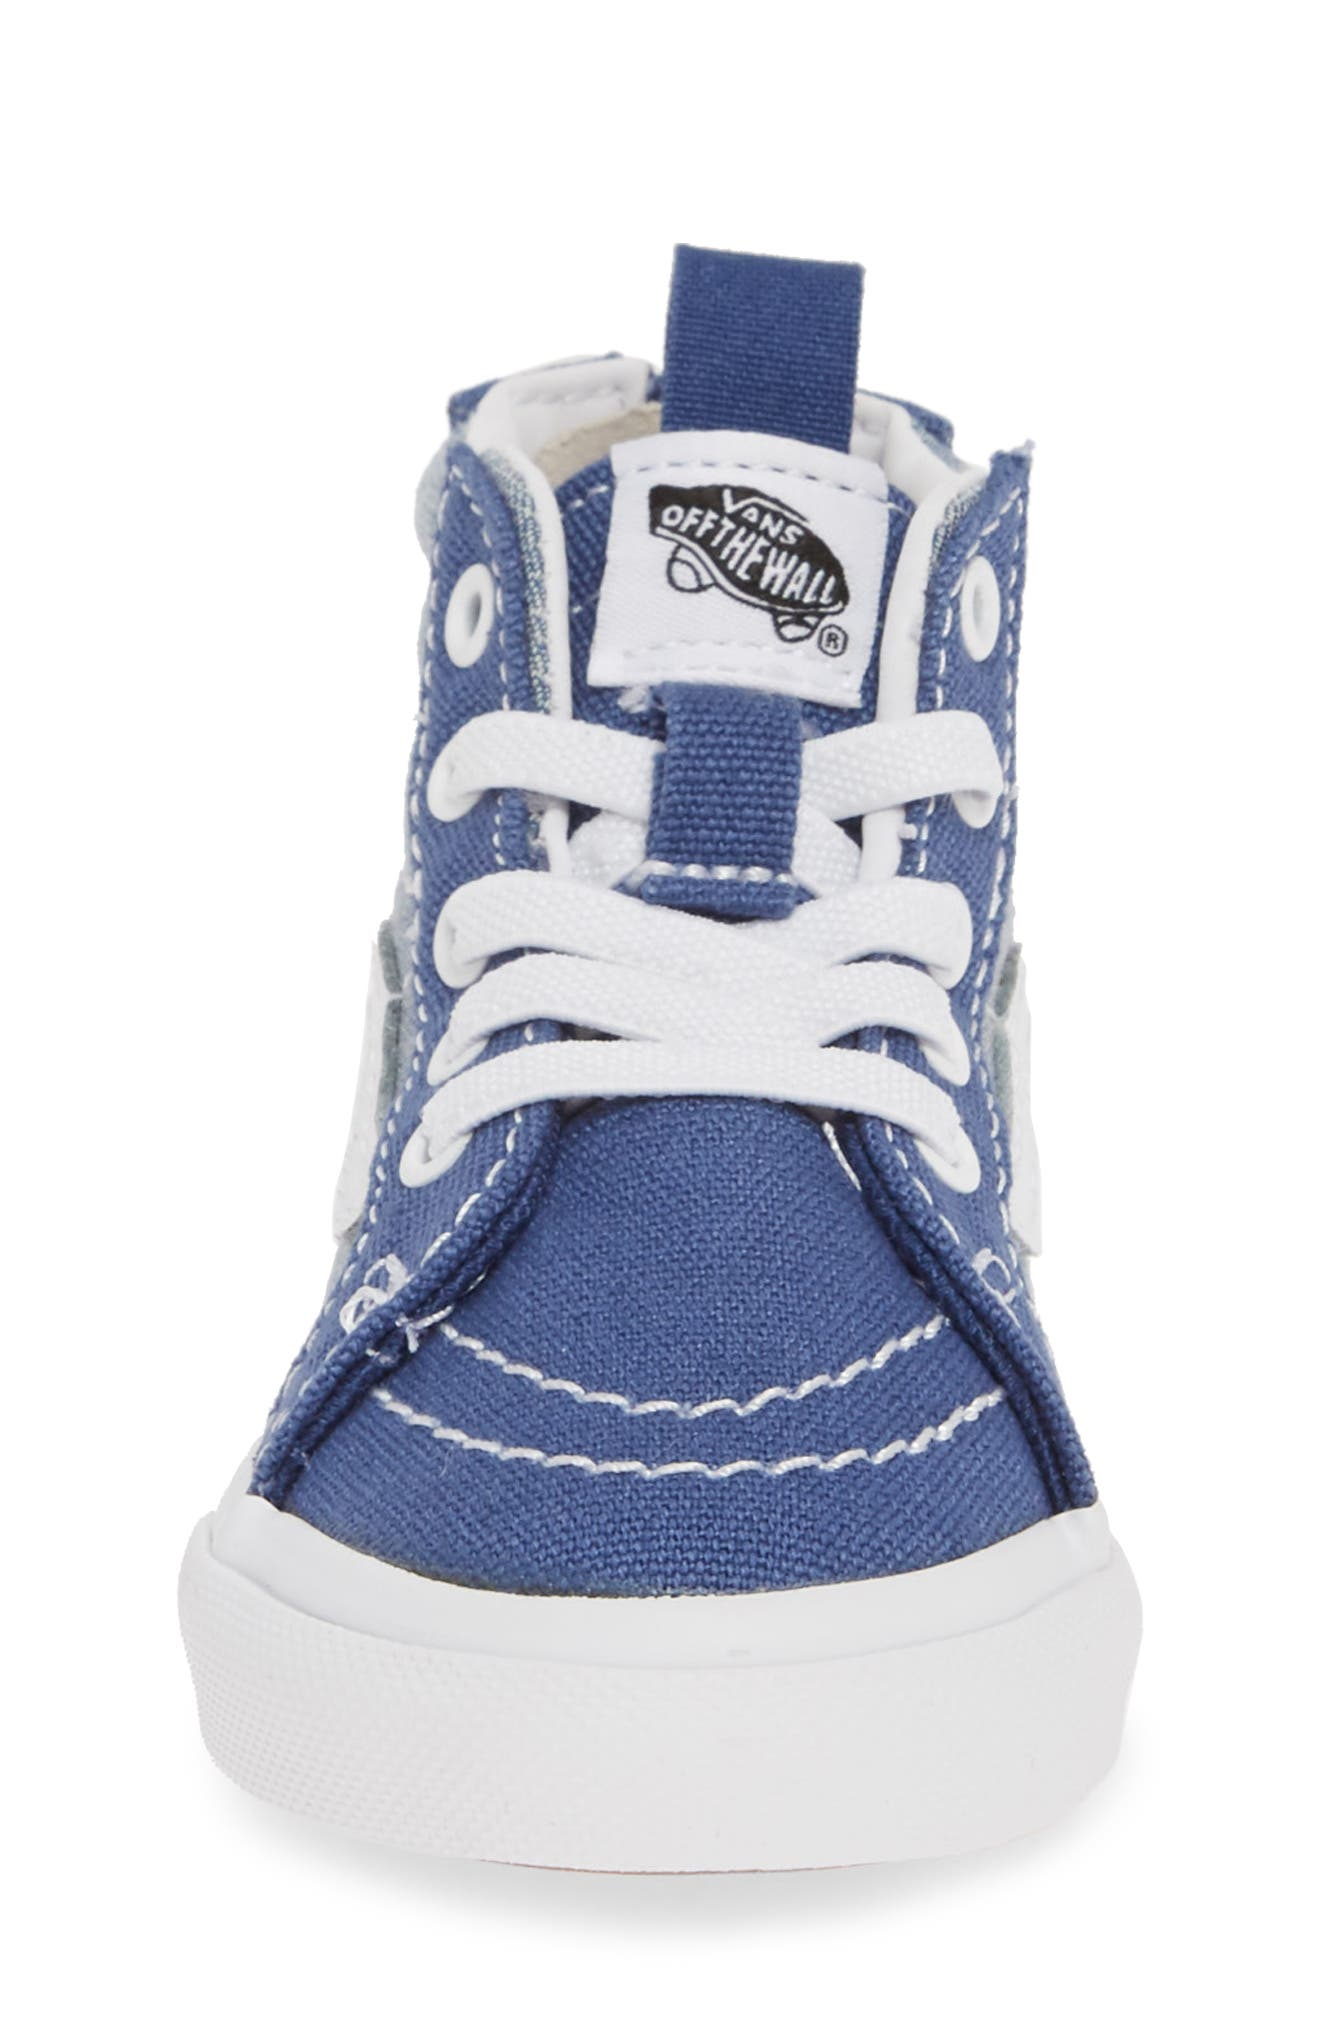 VANS, 'Sk8-Hi' Sneaker, Alternate thumbnail 4, color, CHAMBRAY CANVAS NAVY/ WHITE